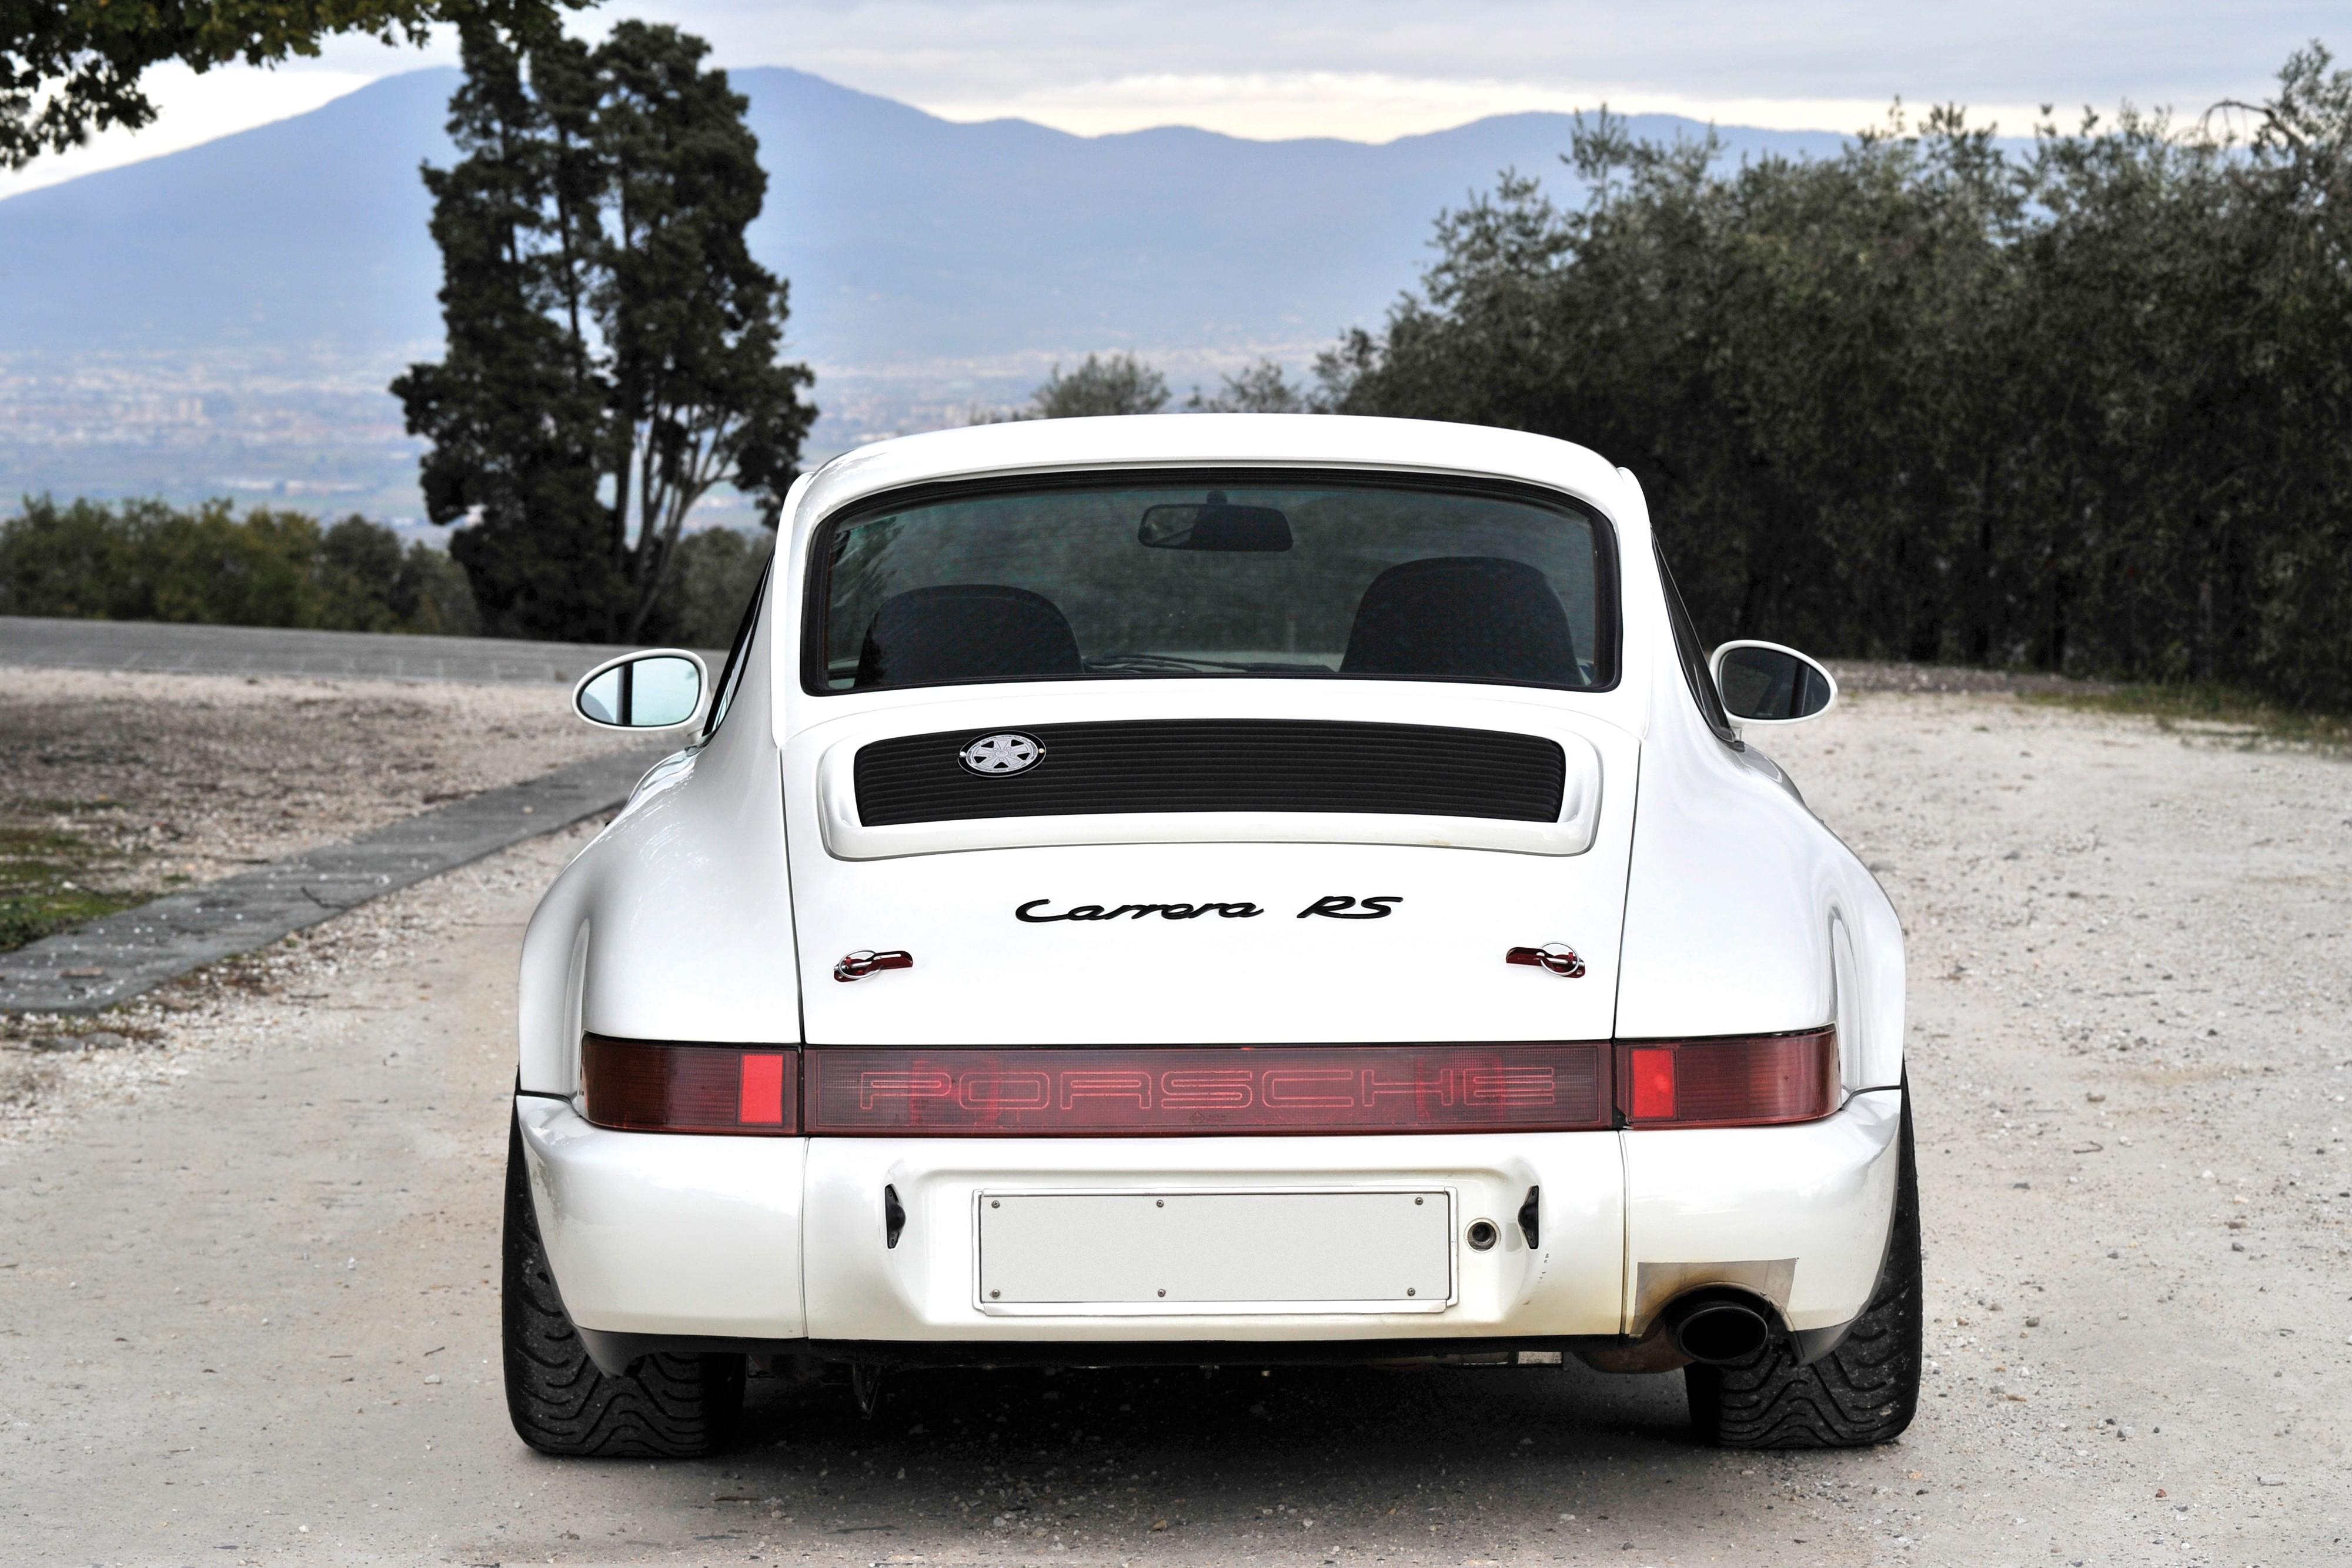 porsche rs carrera 911 964 1992 1991 sotheby rm autoevolution